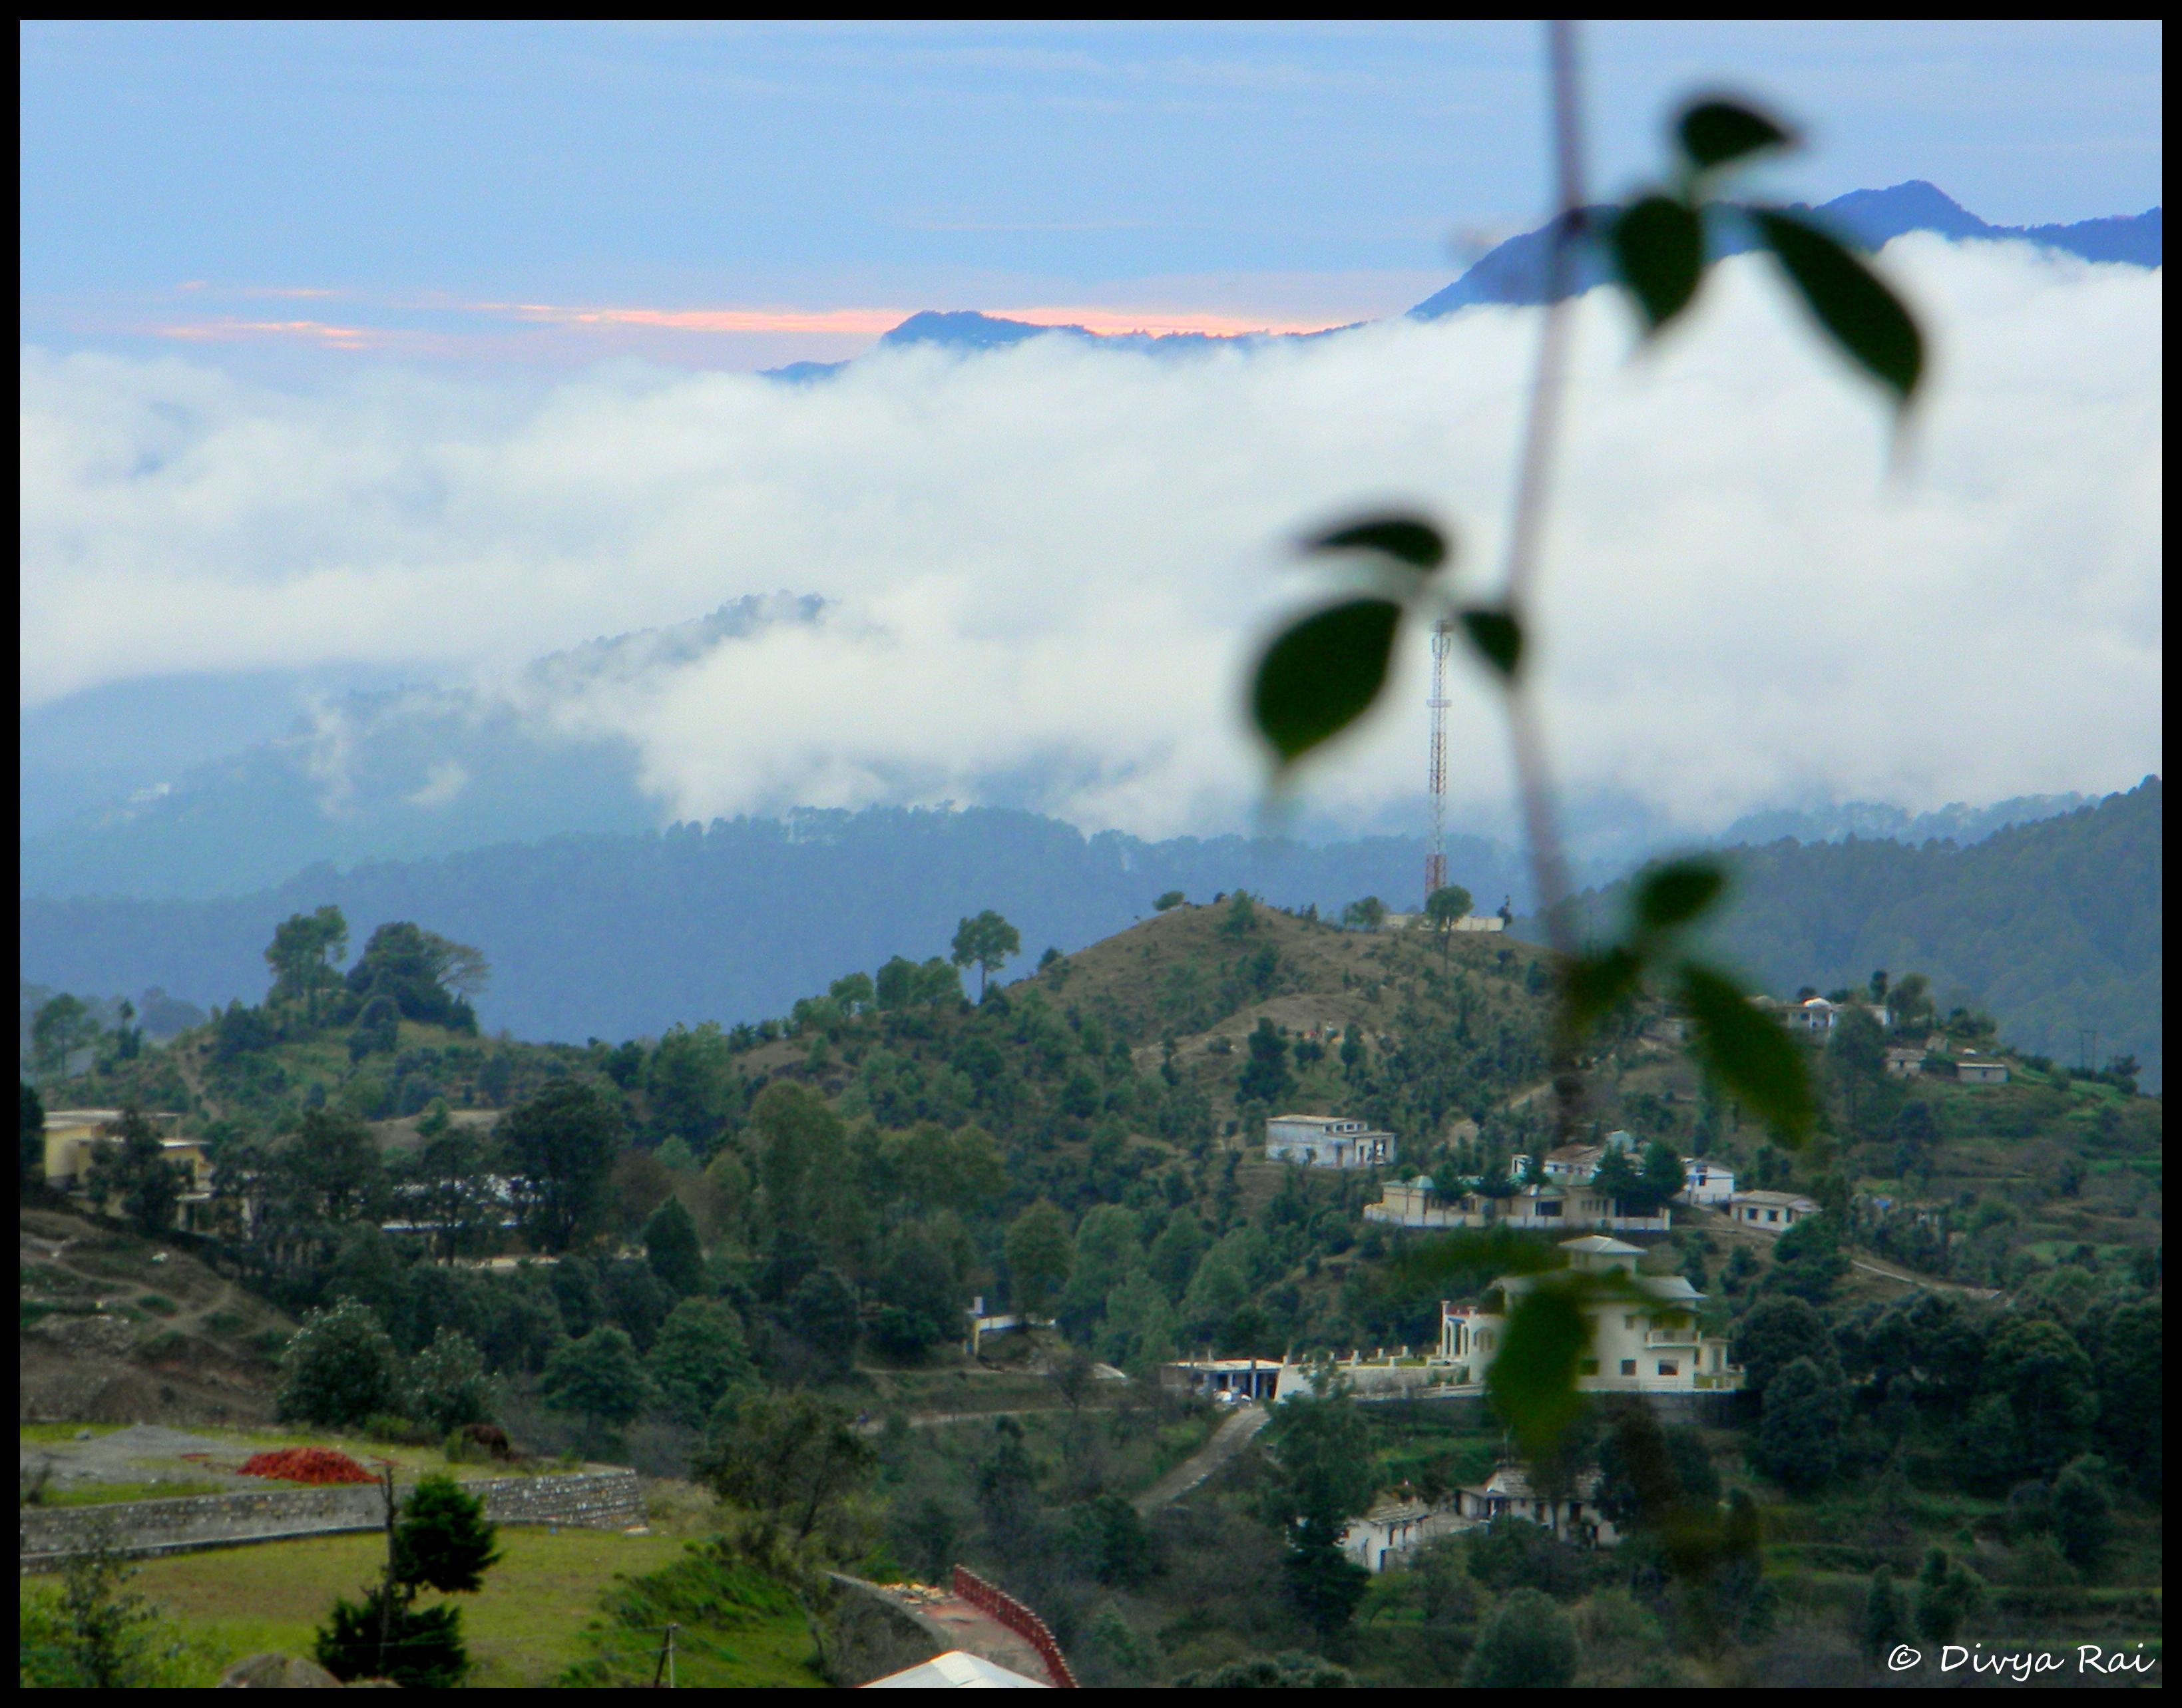 A Himalayan settlement